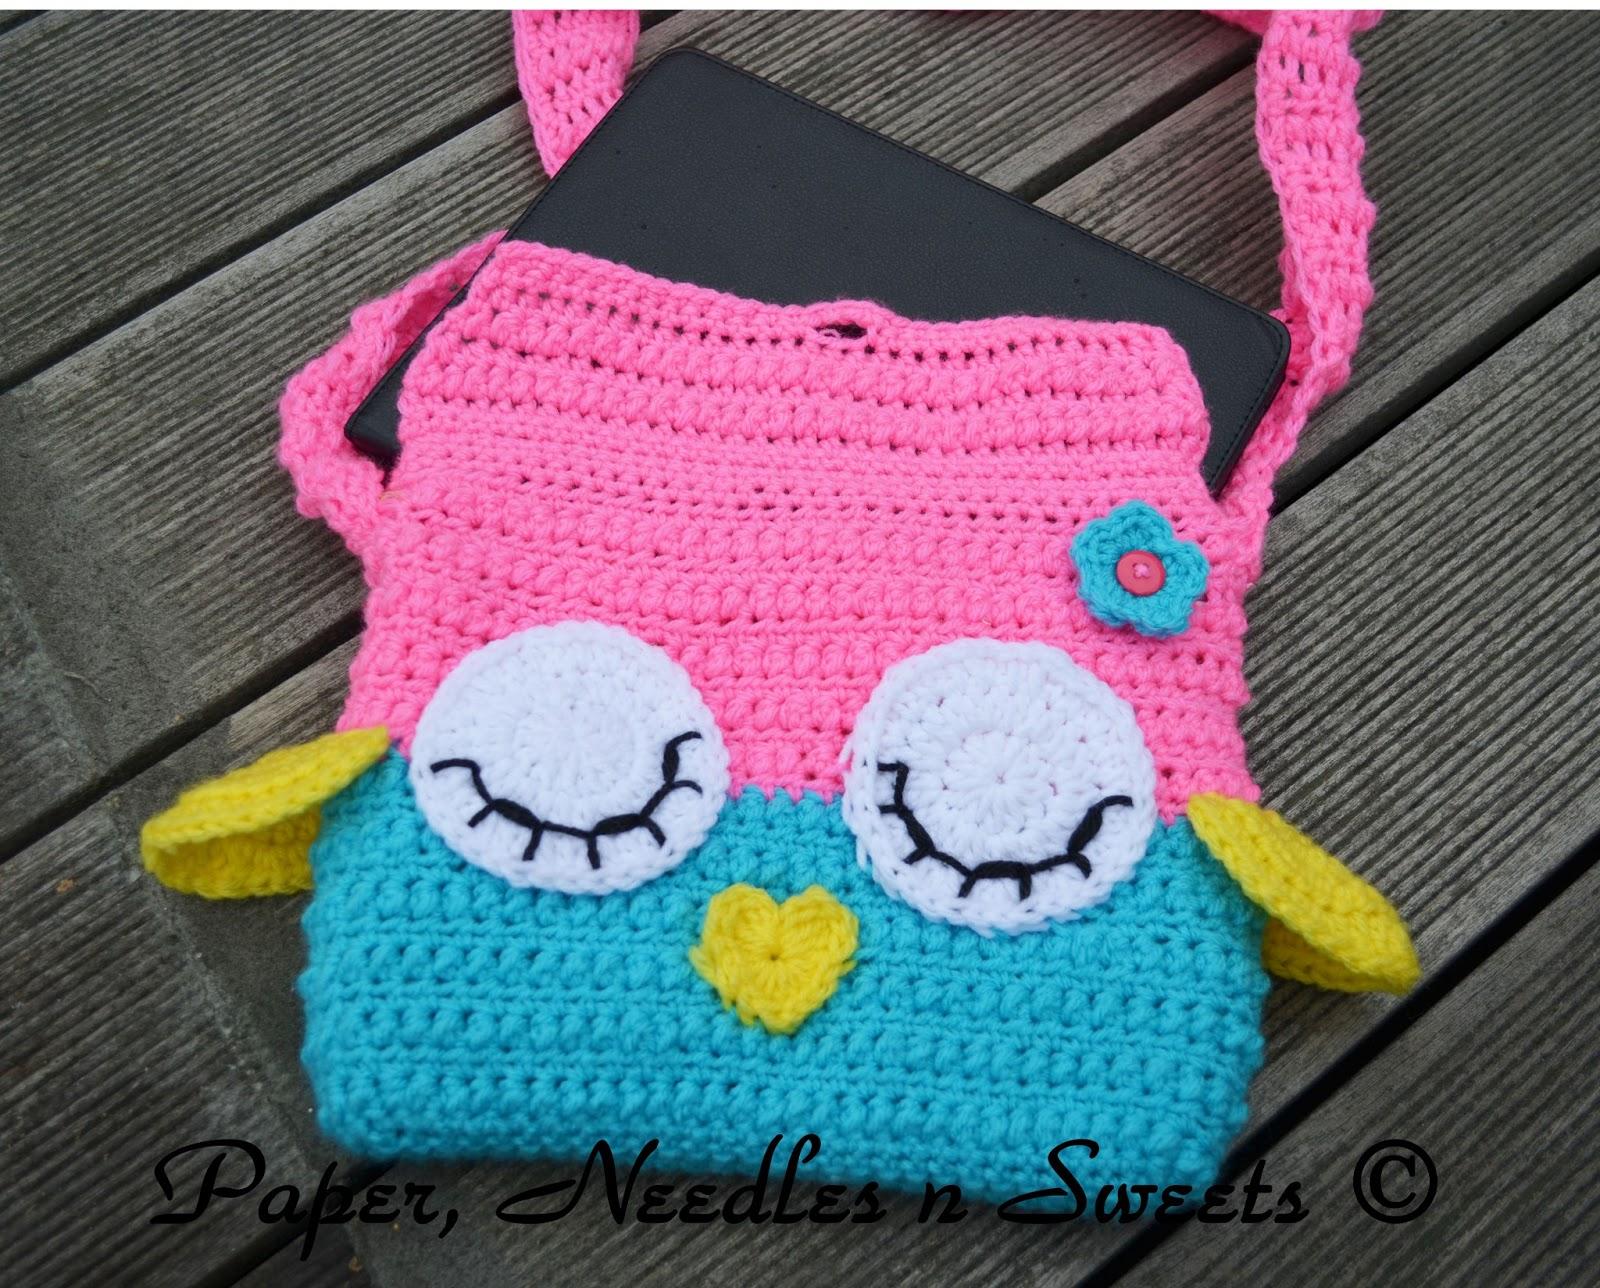 Paper, Needles n Sweets : Sleepy Owl Ipad Crochet Bag